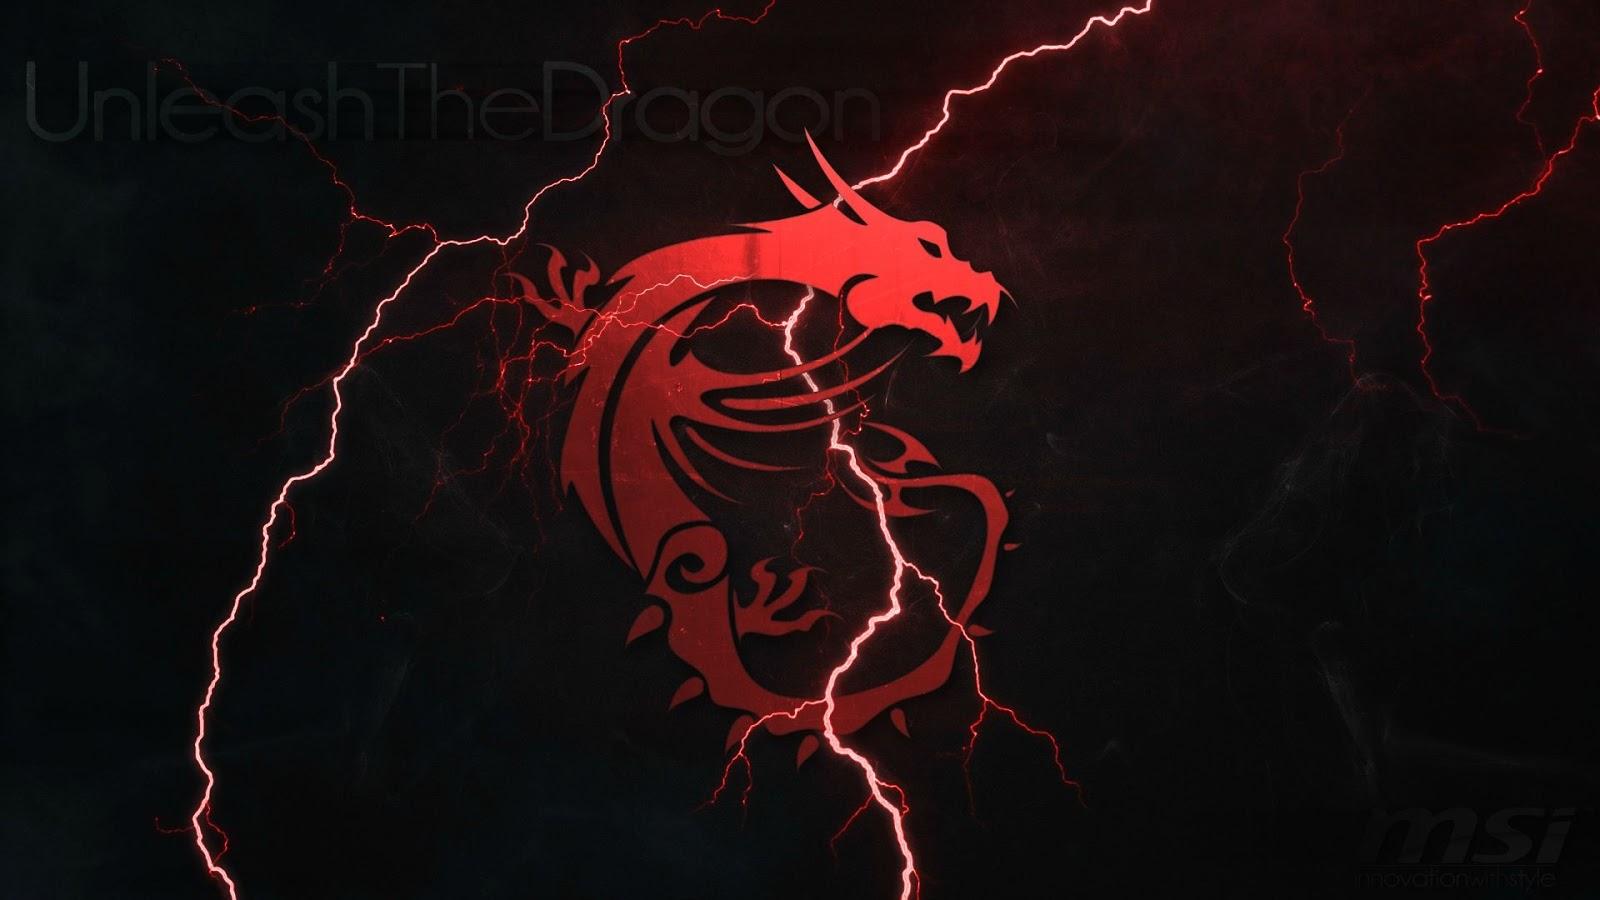 MSI Dragon HD Wallpaper